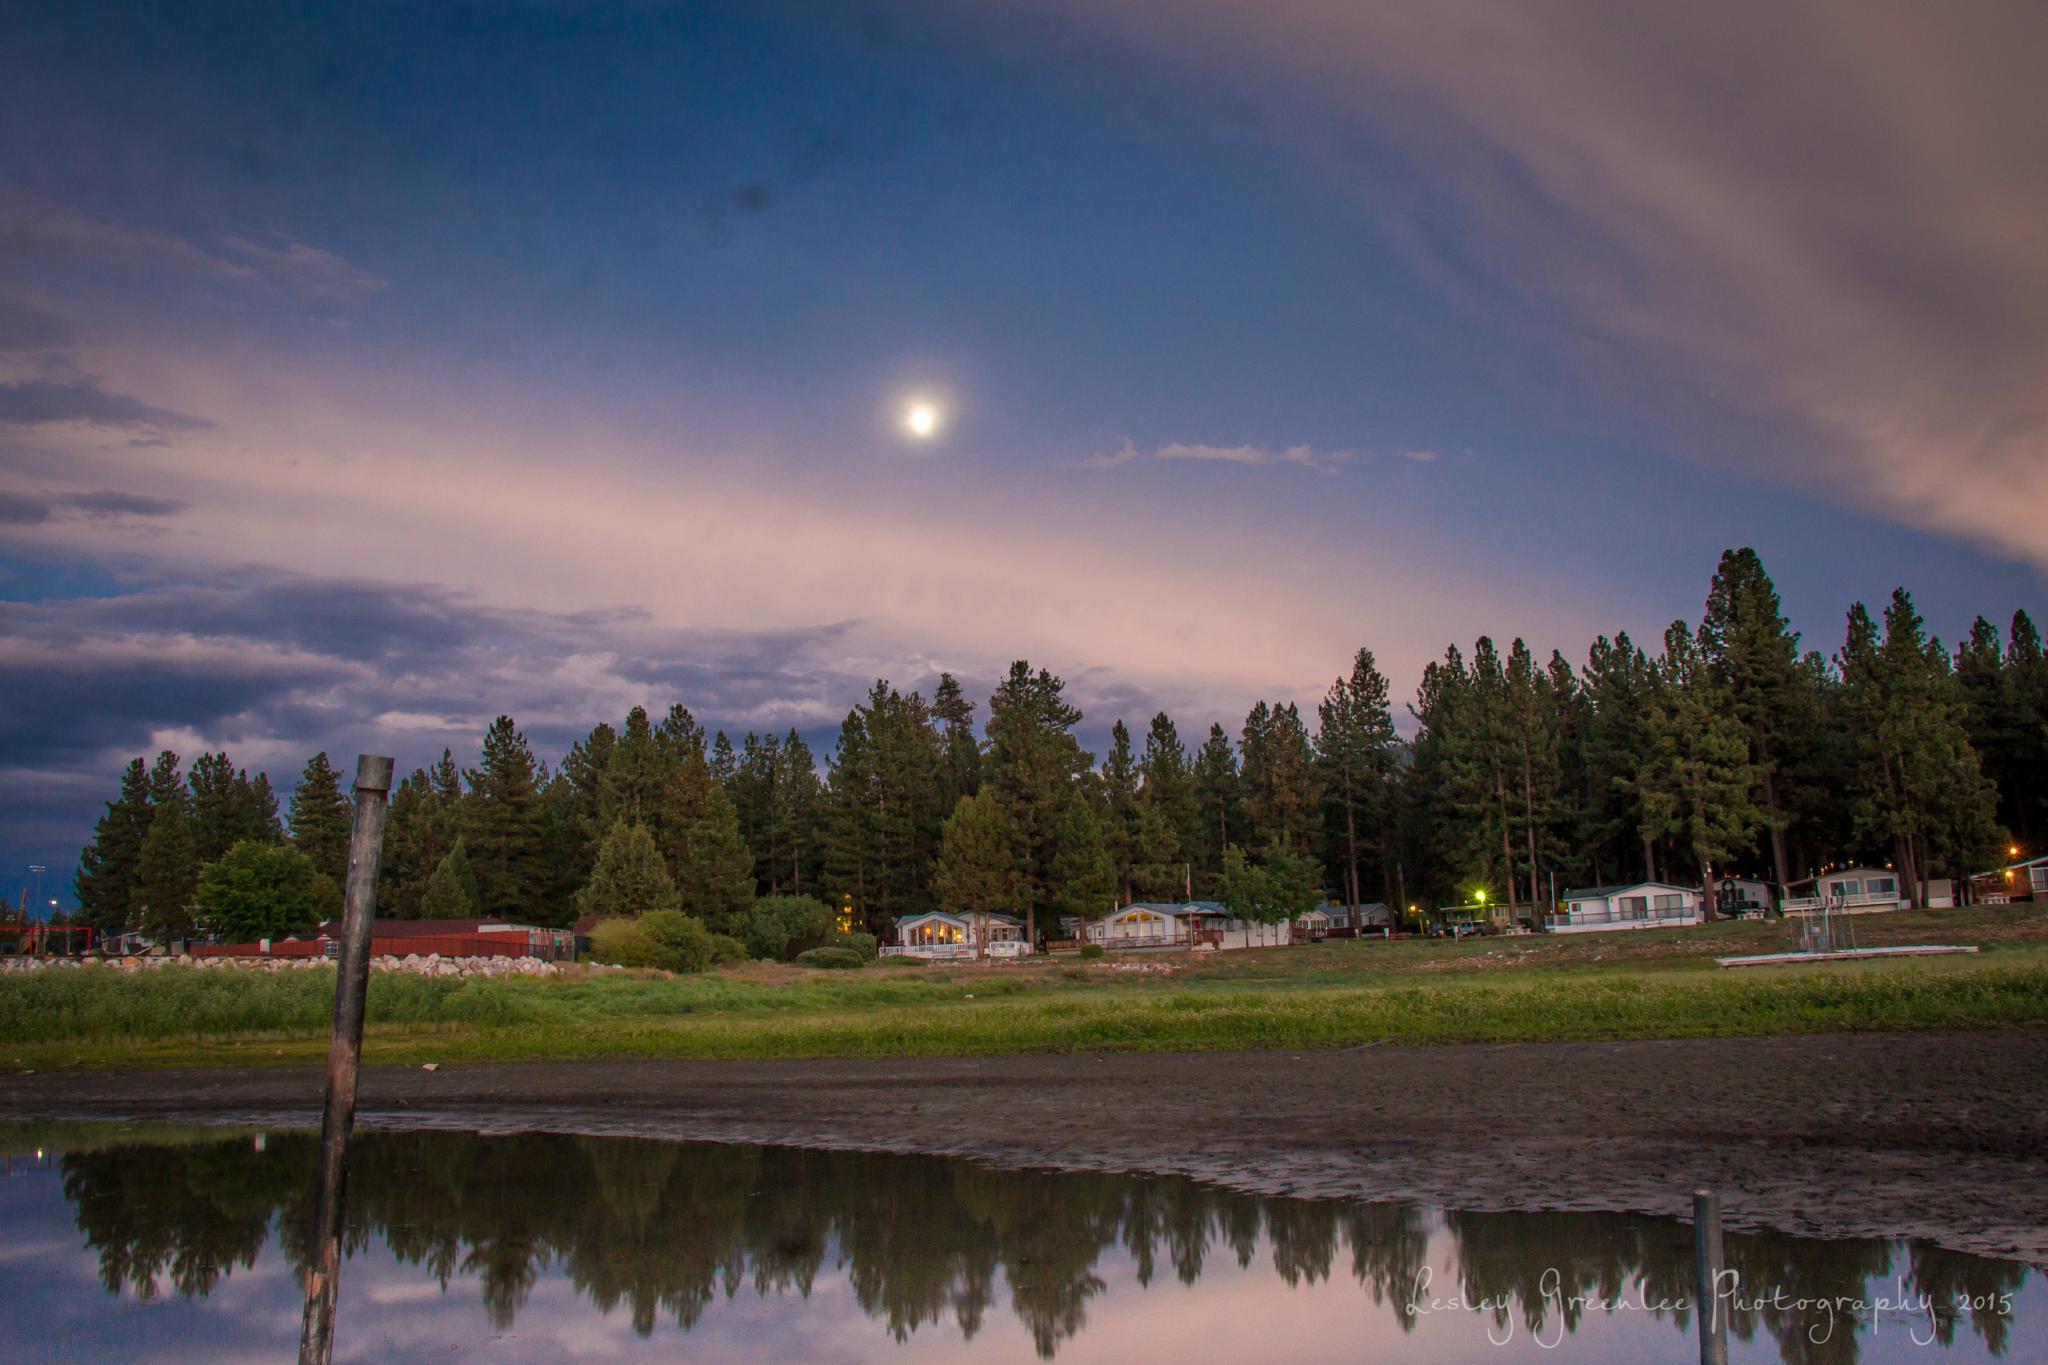 Moon Arising by Petminder